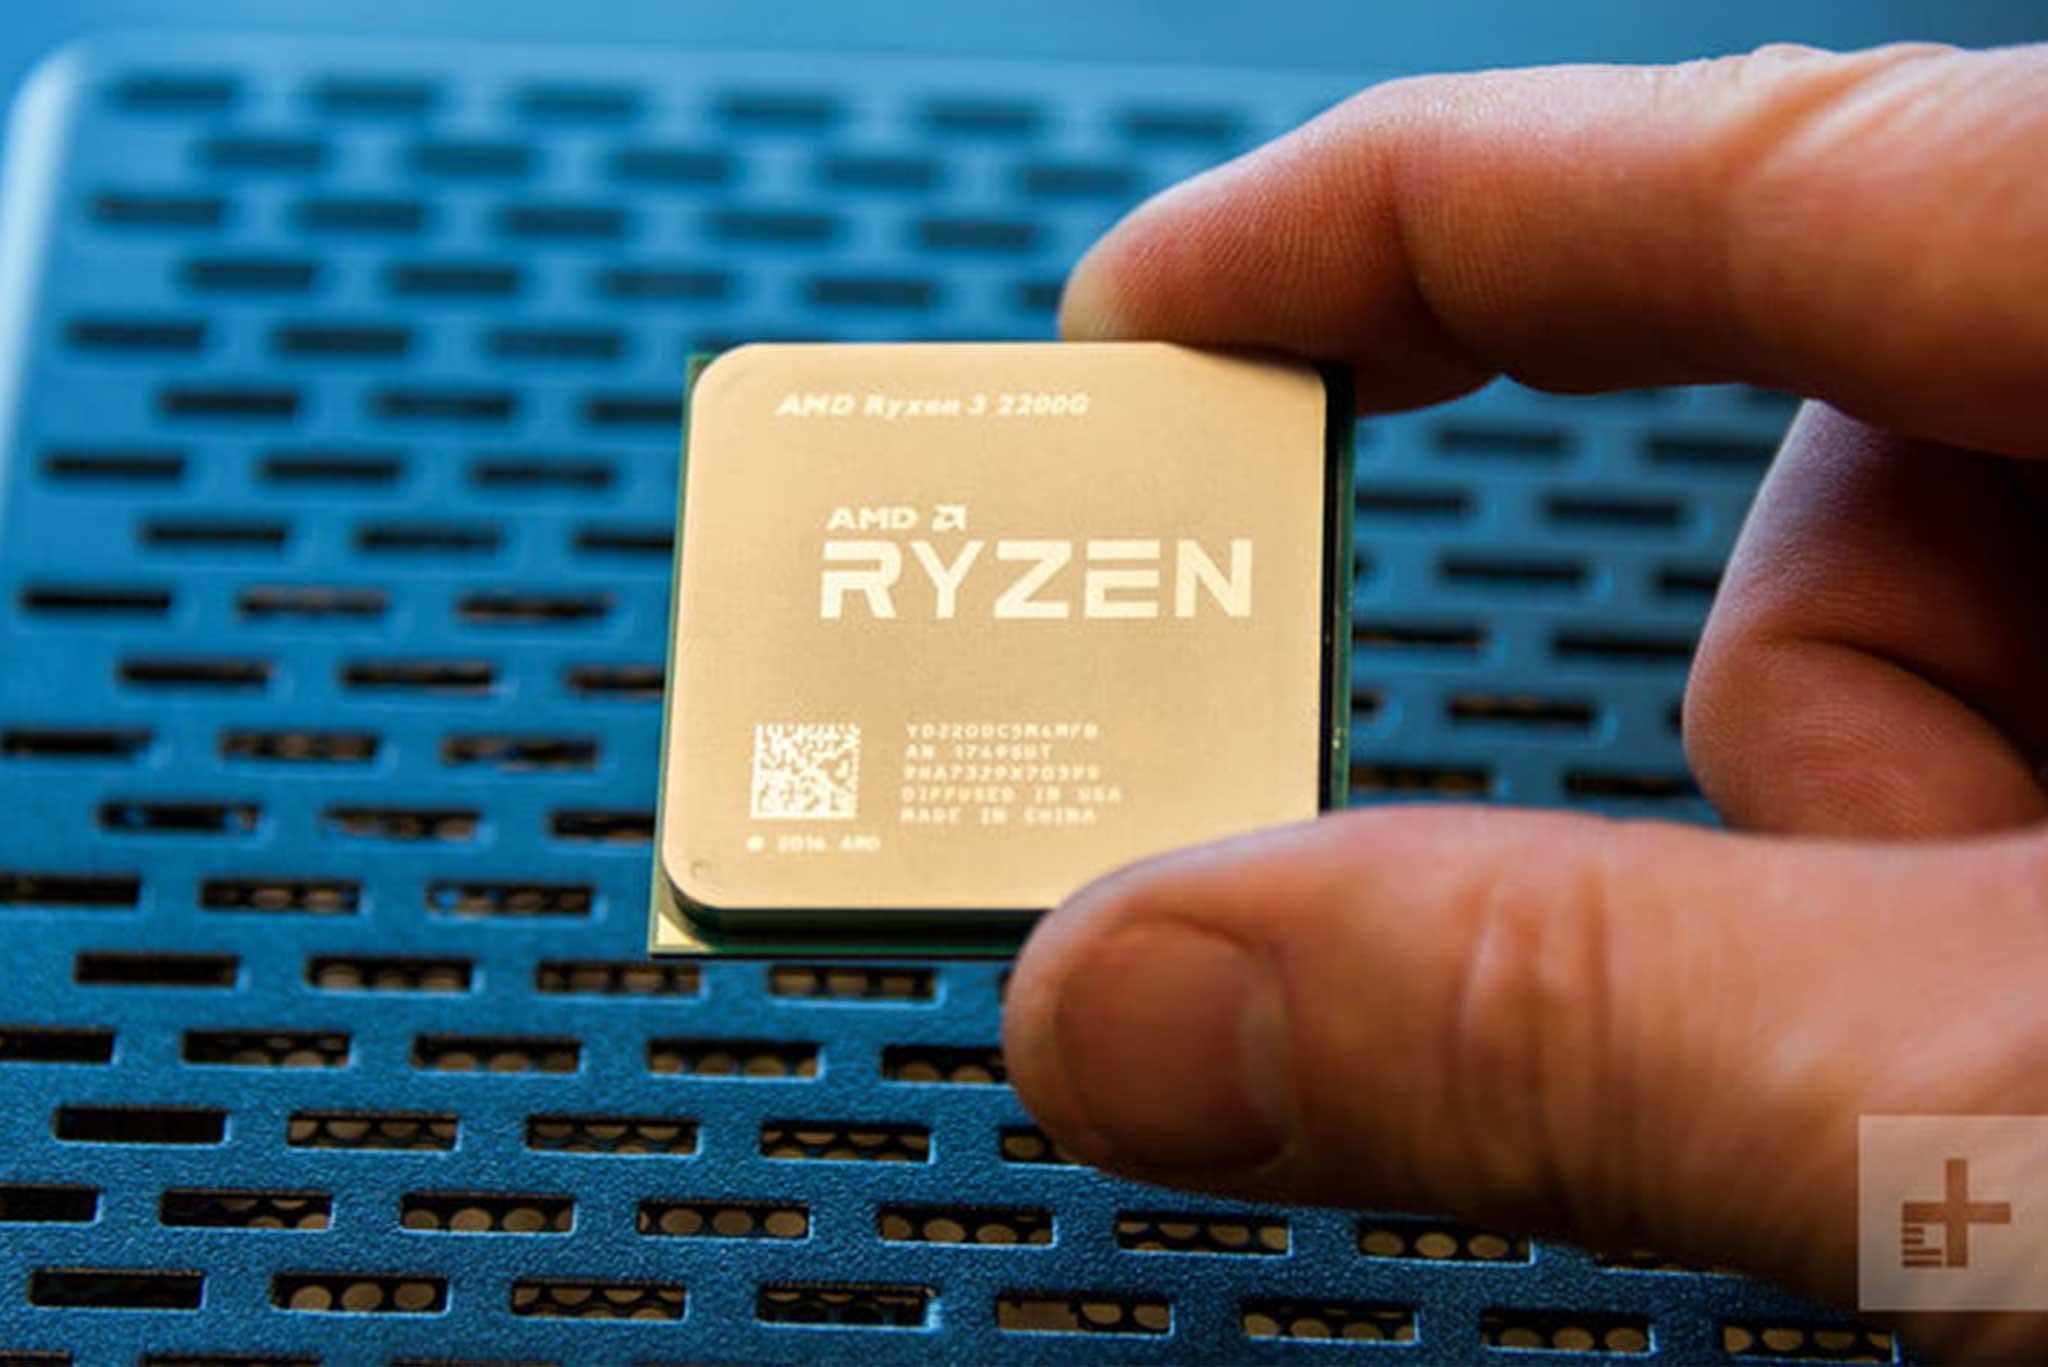 AMD Ryzen CPU prices get slashed ahead of Ryzen 3000 release